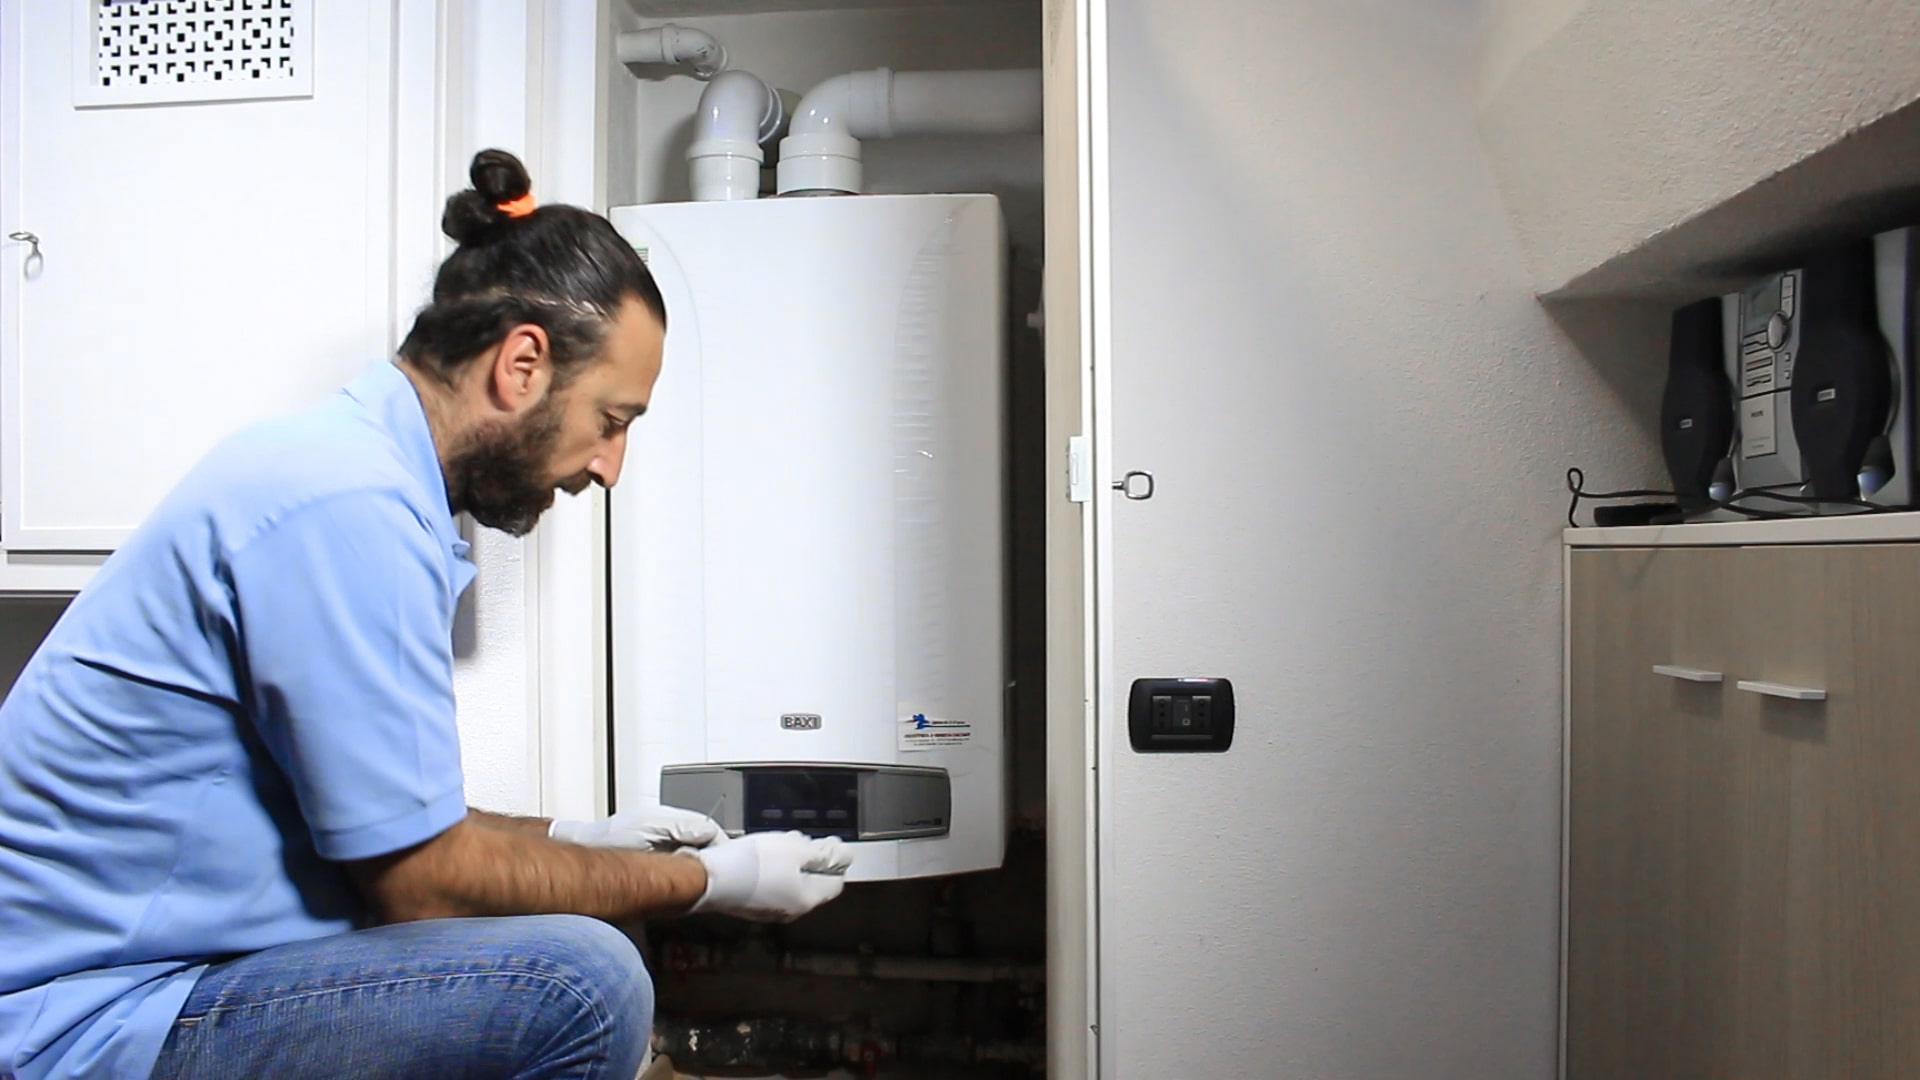 termotecnico tecnico Desivero ripara caldaia